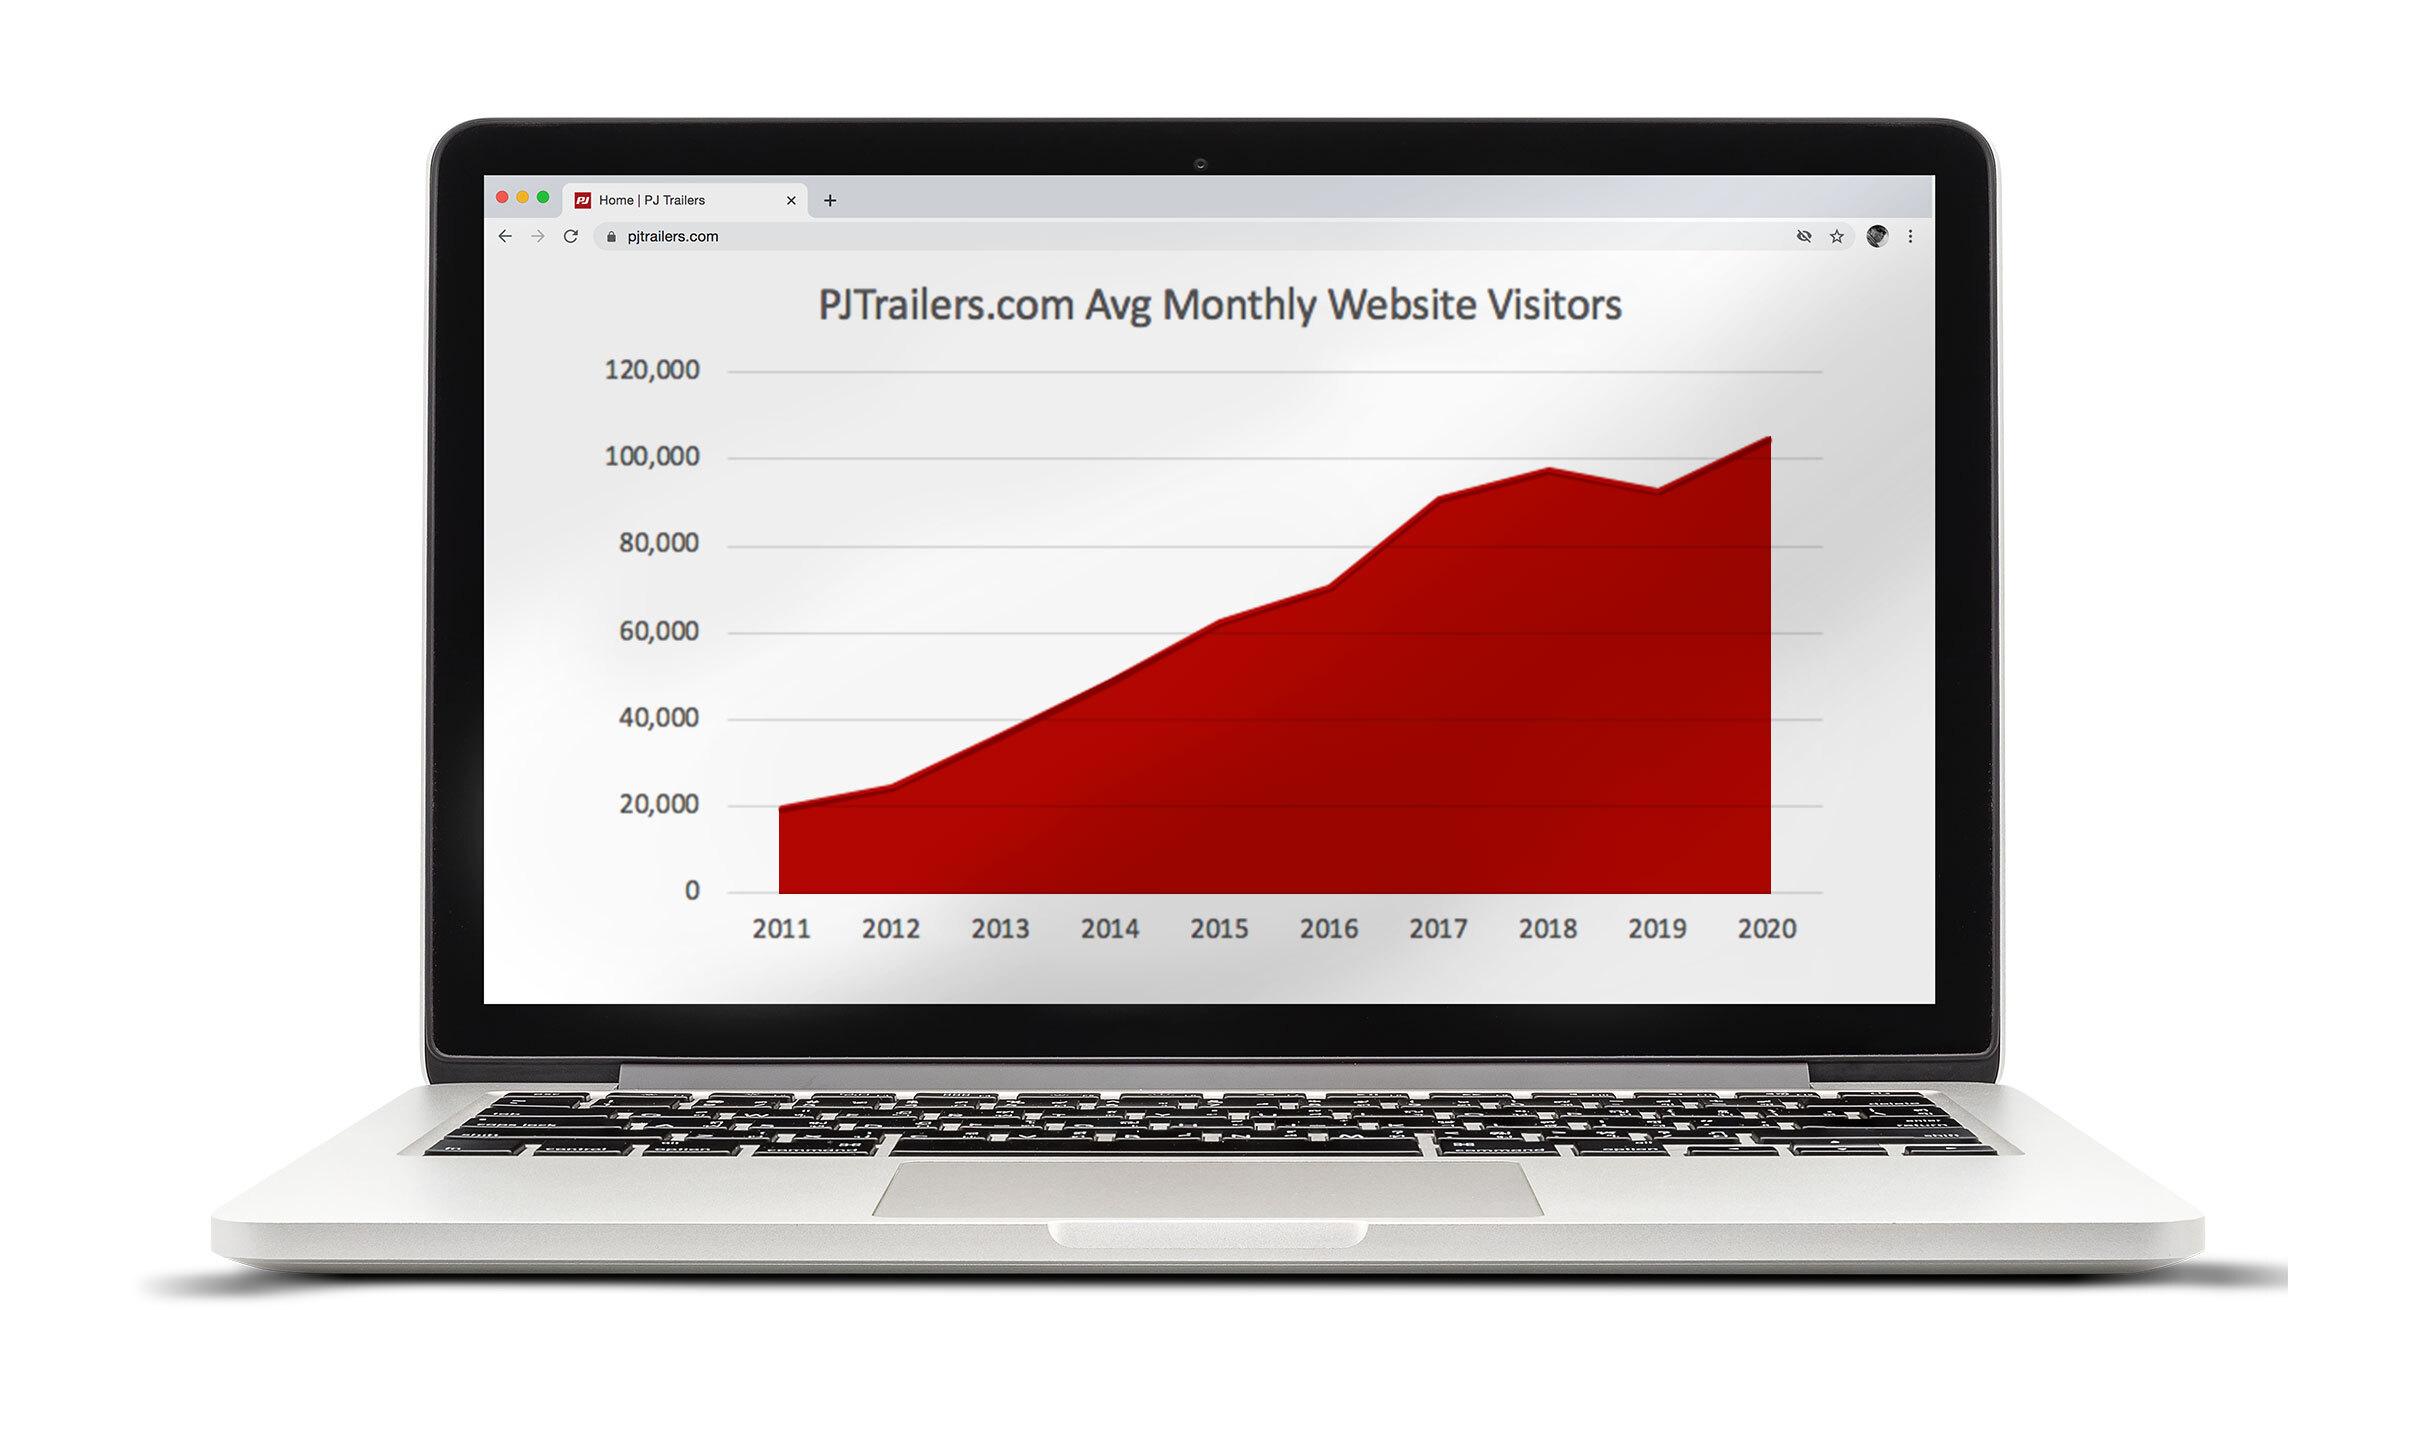 Laptop featuring PJ Trailers website analytics